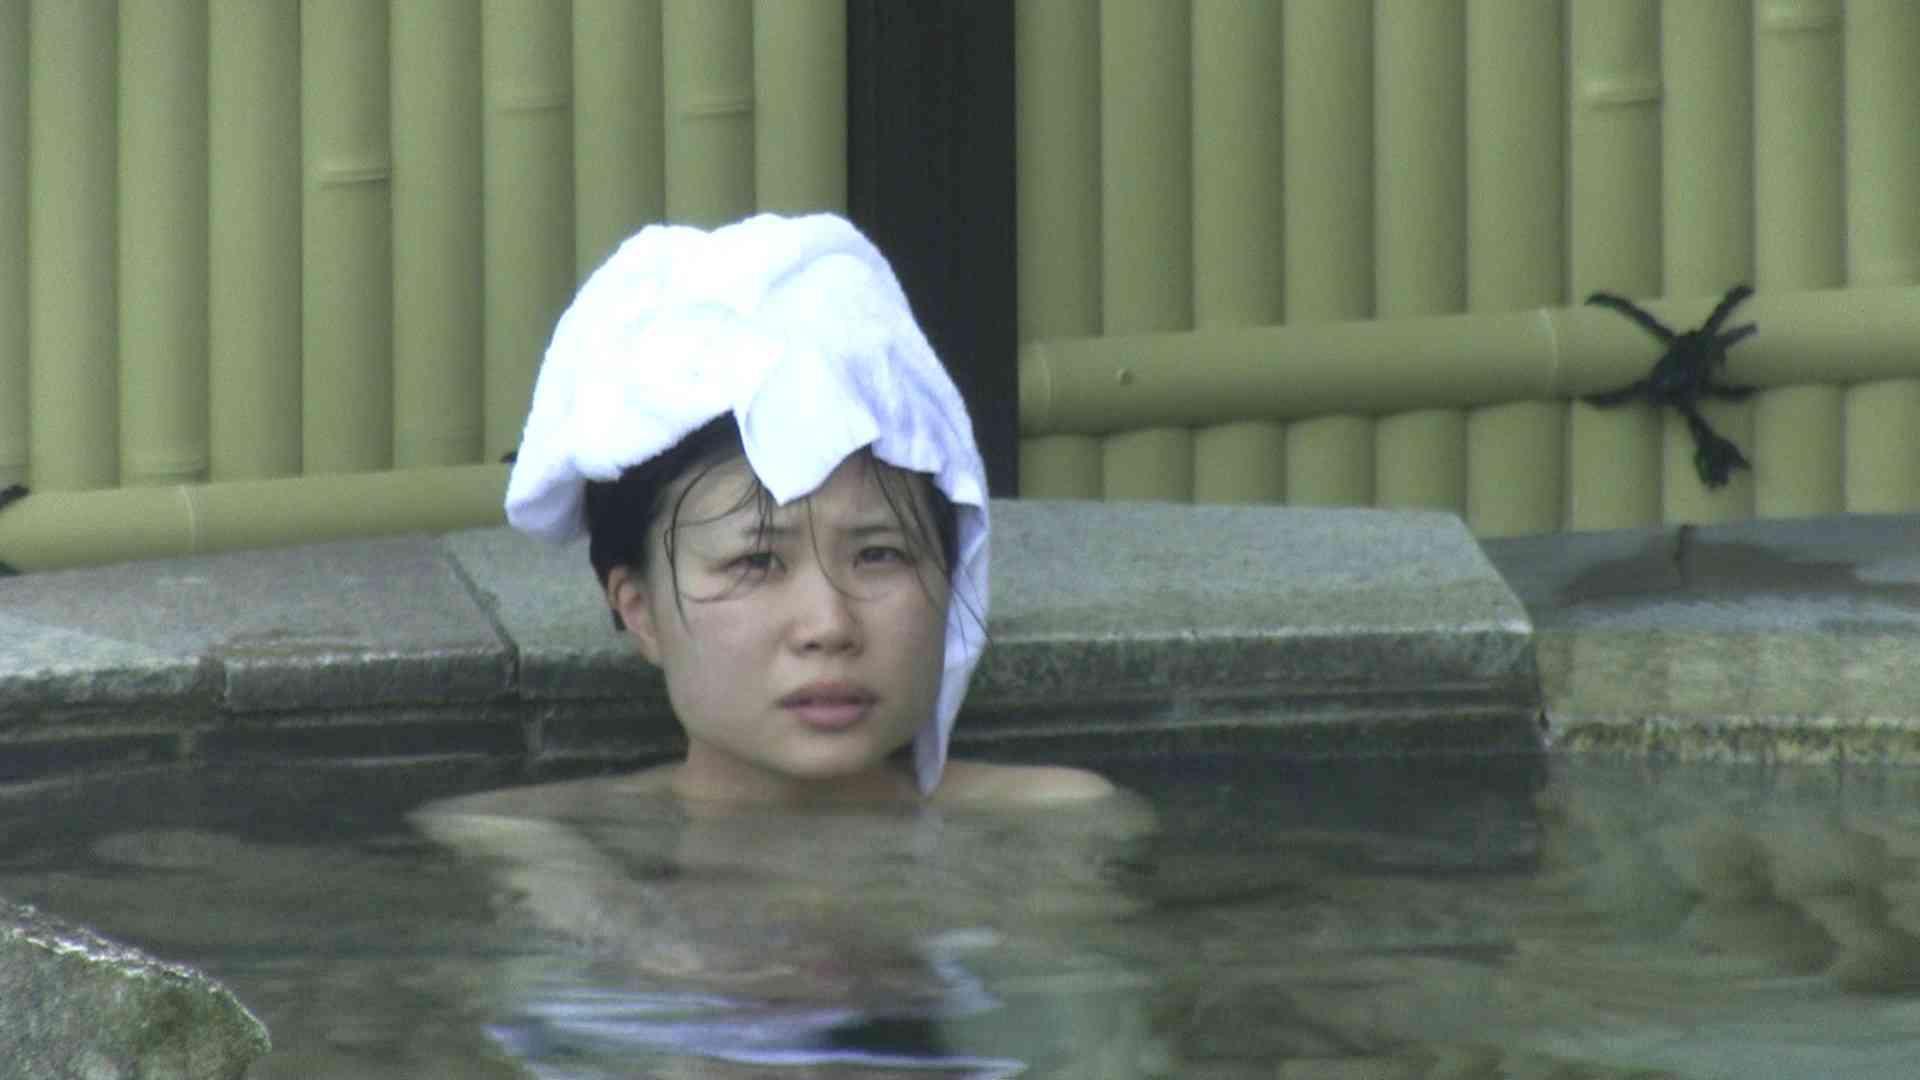 Aquaな露天風呂Vol.183 盗撮 | OLセックス  69画像 43